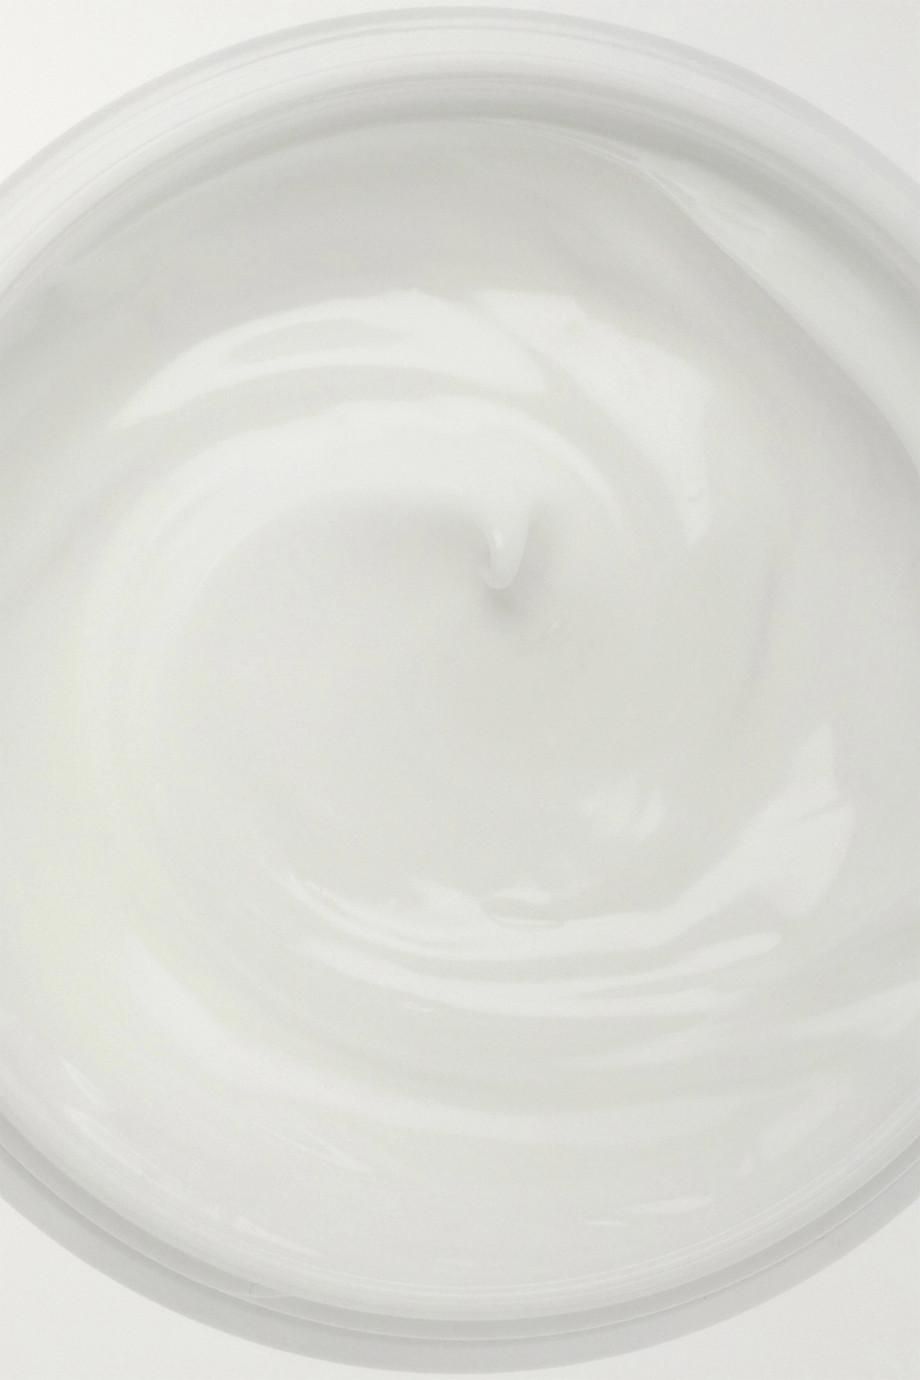 Eve Lom TLC Cream, 50ml – Feuchtigkeitscreme